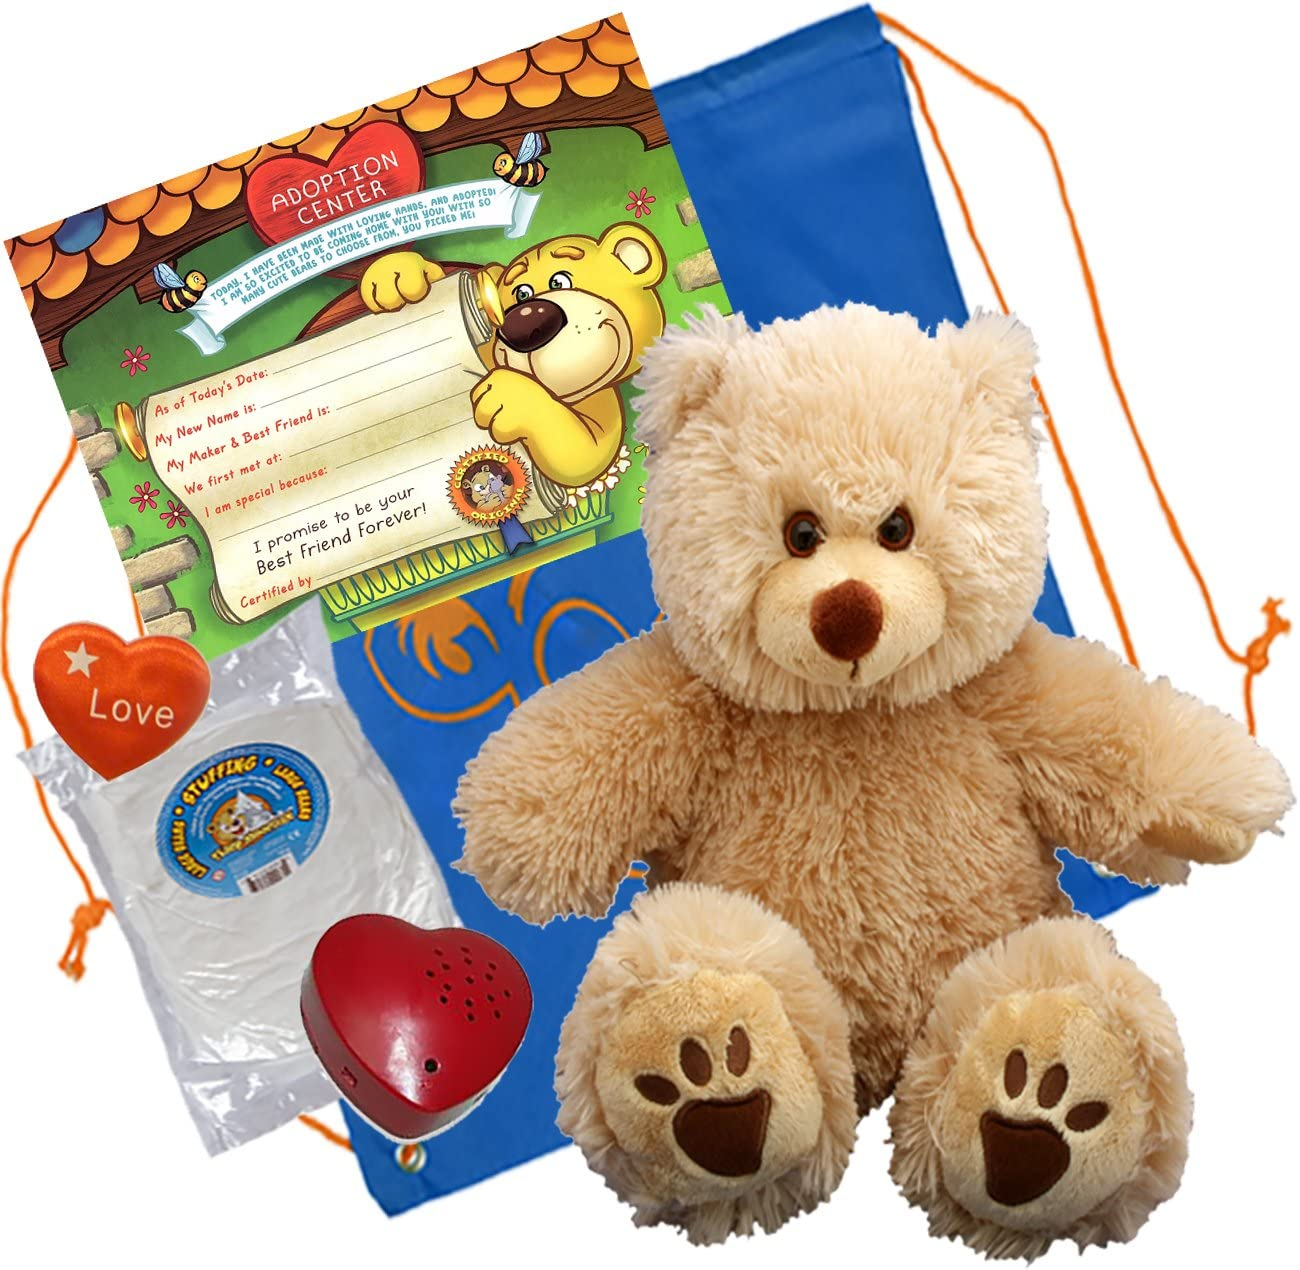 Teddy Mountain Goldie a Very Furry Bear (16